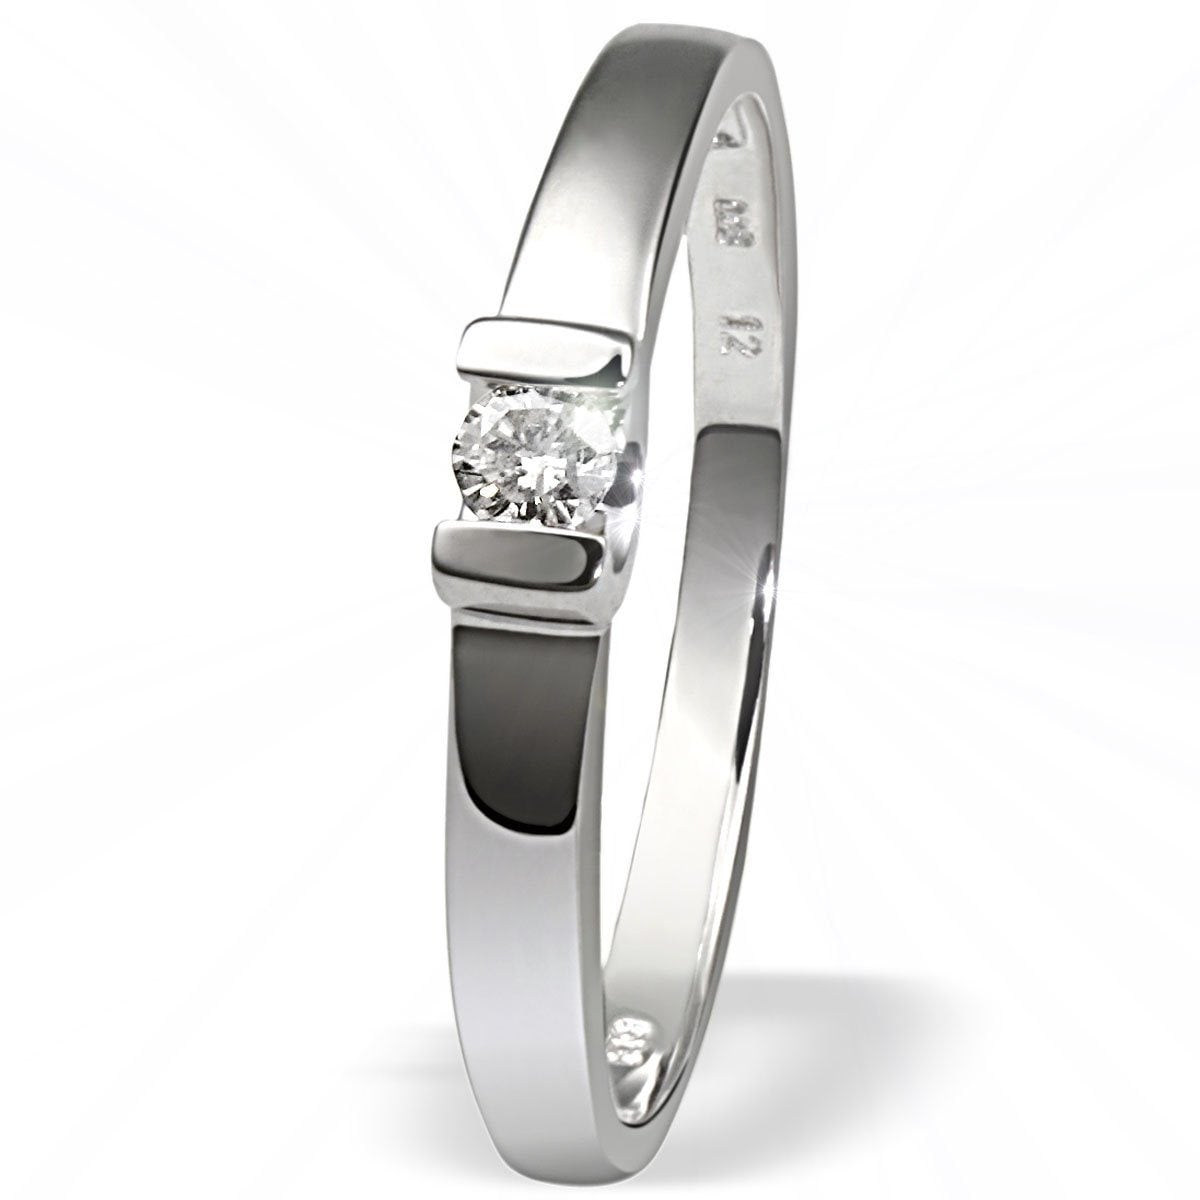 goldmaid Damenring Verlobungsring 585/- Weißgold 1 Brillant 0,08 ct. | Schmuck > Ringe > Verlobungsringe | Weiß | GOLDMAID